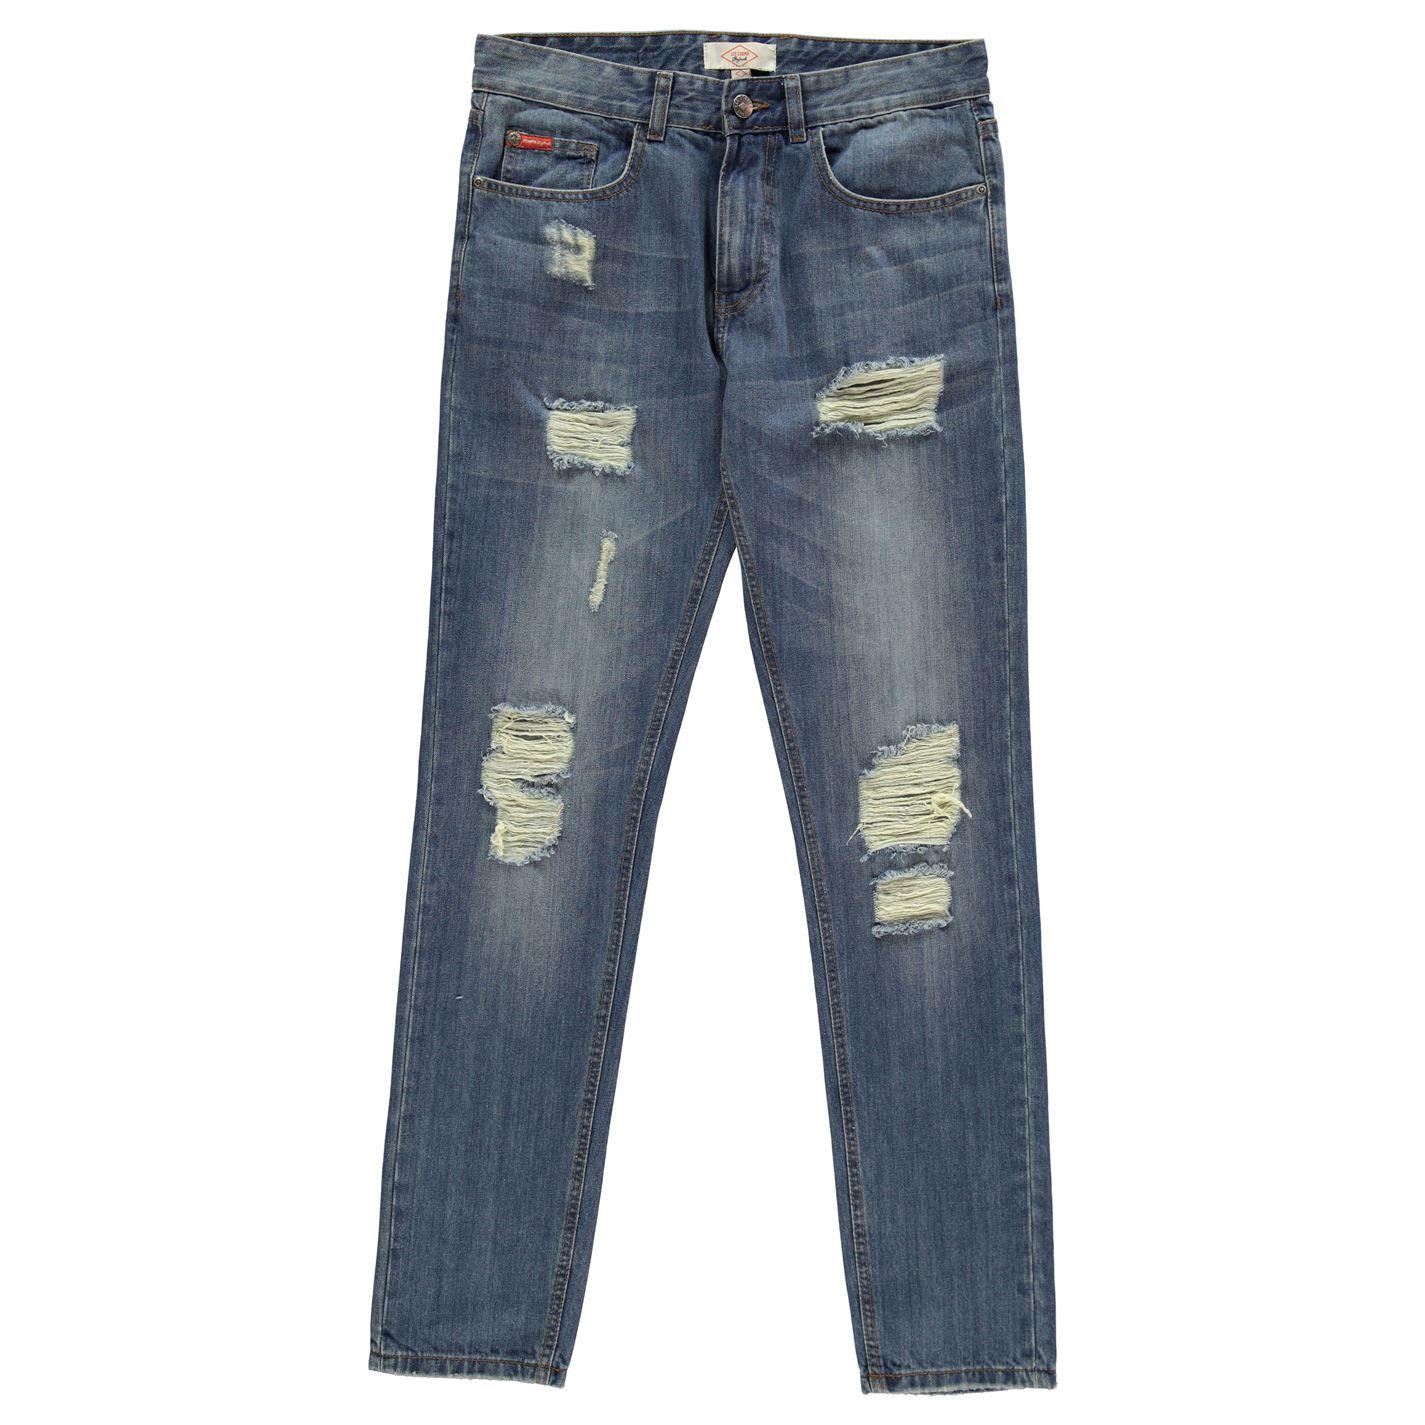 Lee Cooper Vintage Ripped Jeans Mens